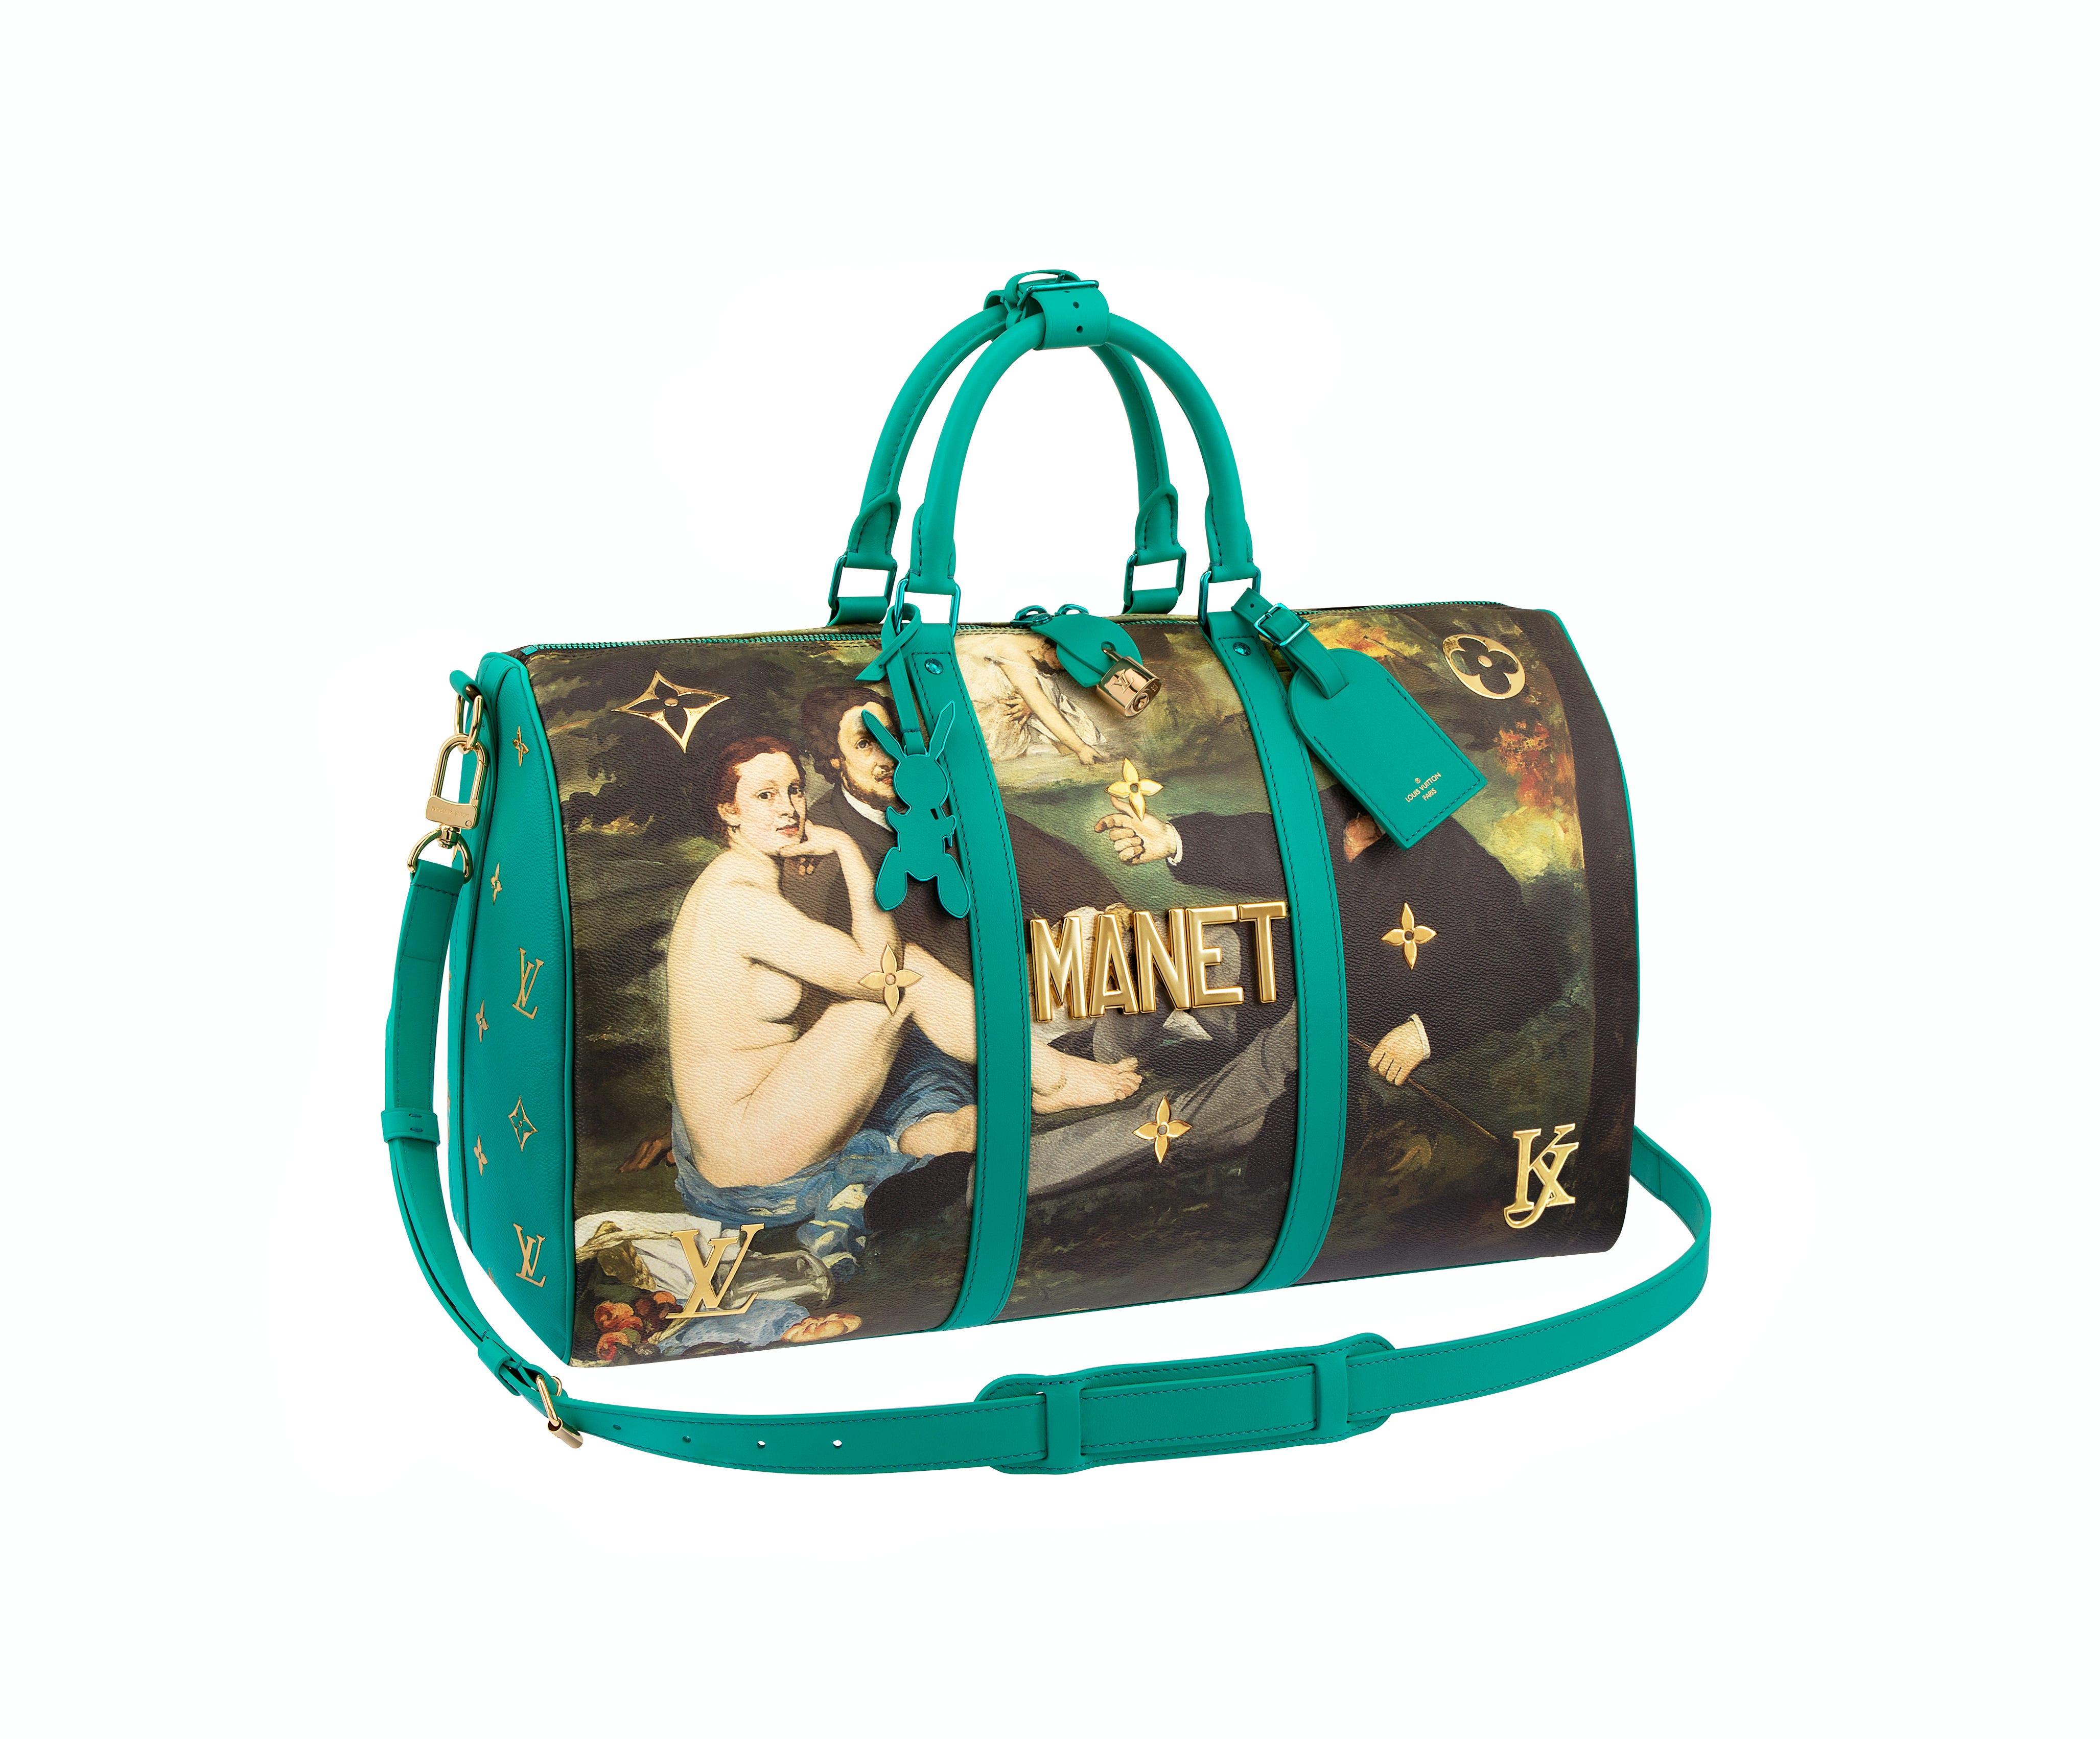 e7563745fb Louis Vuitton Jeff Koons Collaboration Handbags